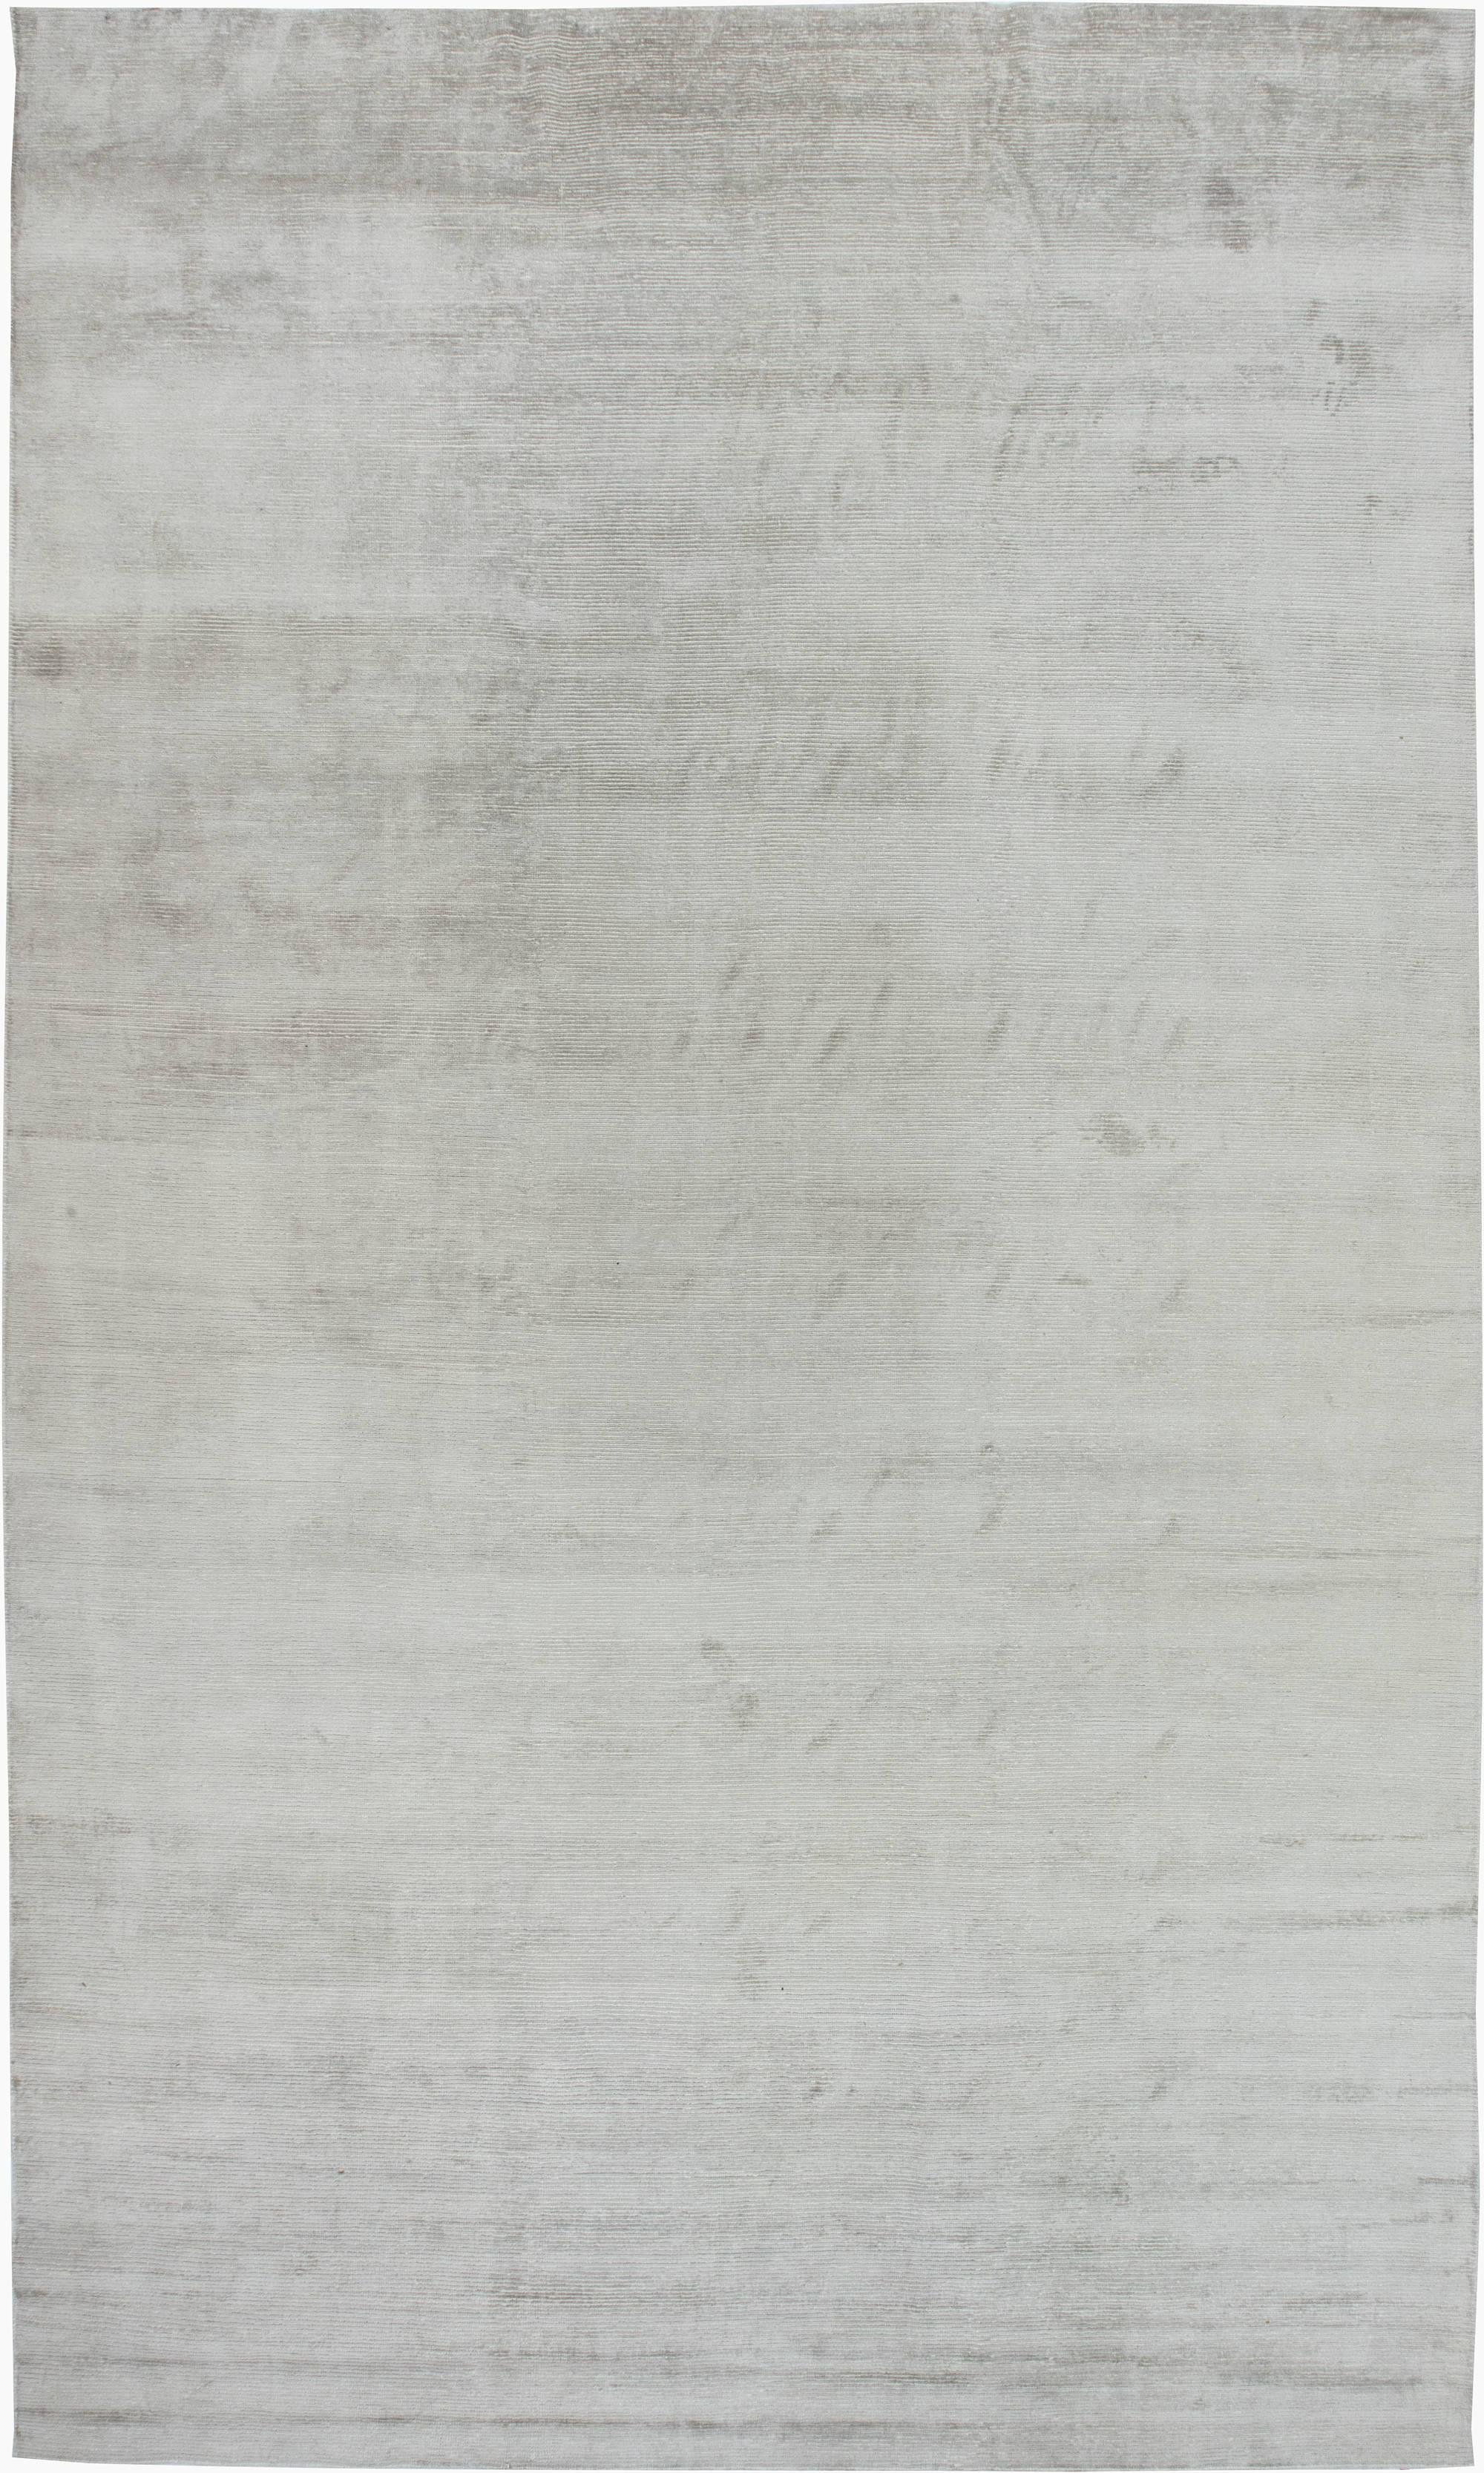 line grip modern carpet n11586. arrow down  47161db02bae4ef92bdede423862e8f0c2b91f81311572b5a8bb90eef3001a34 VZQRTKD